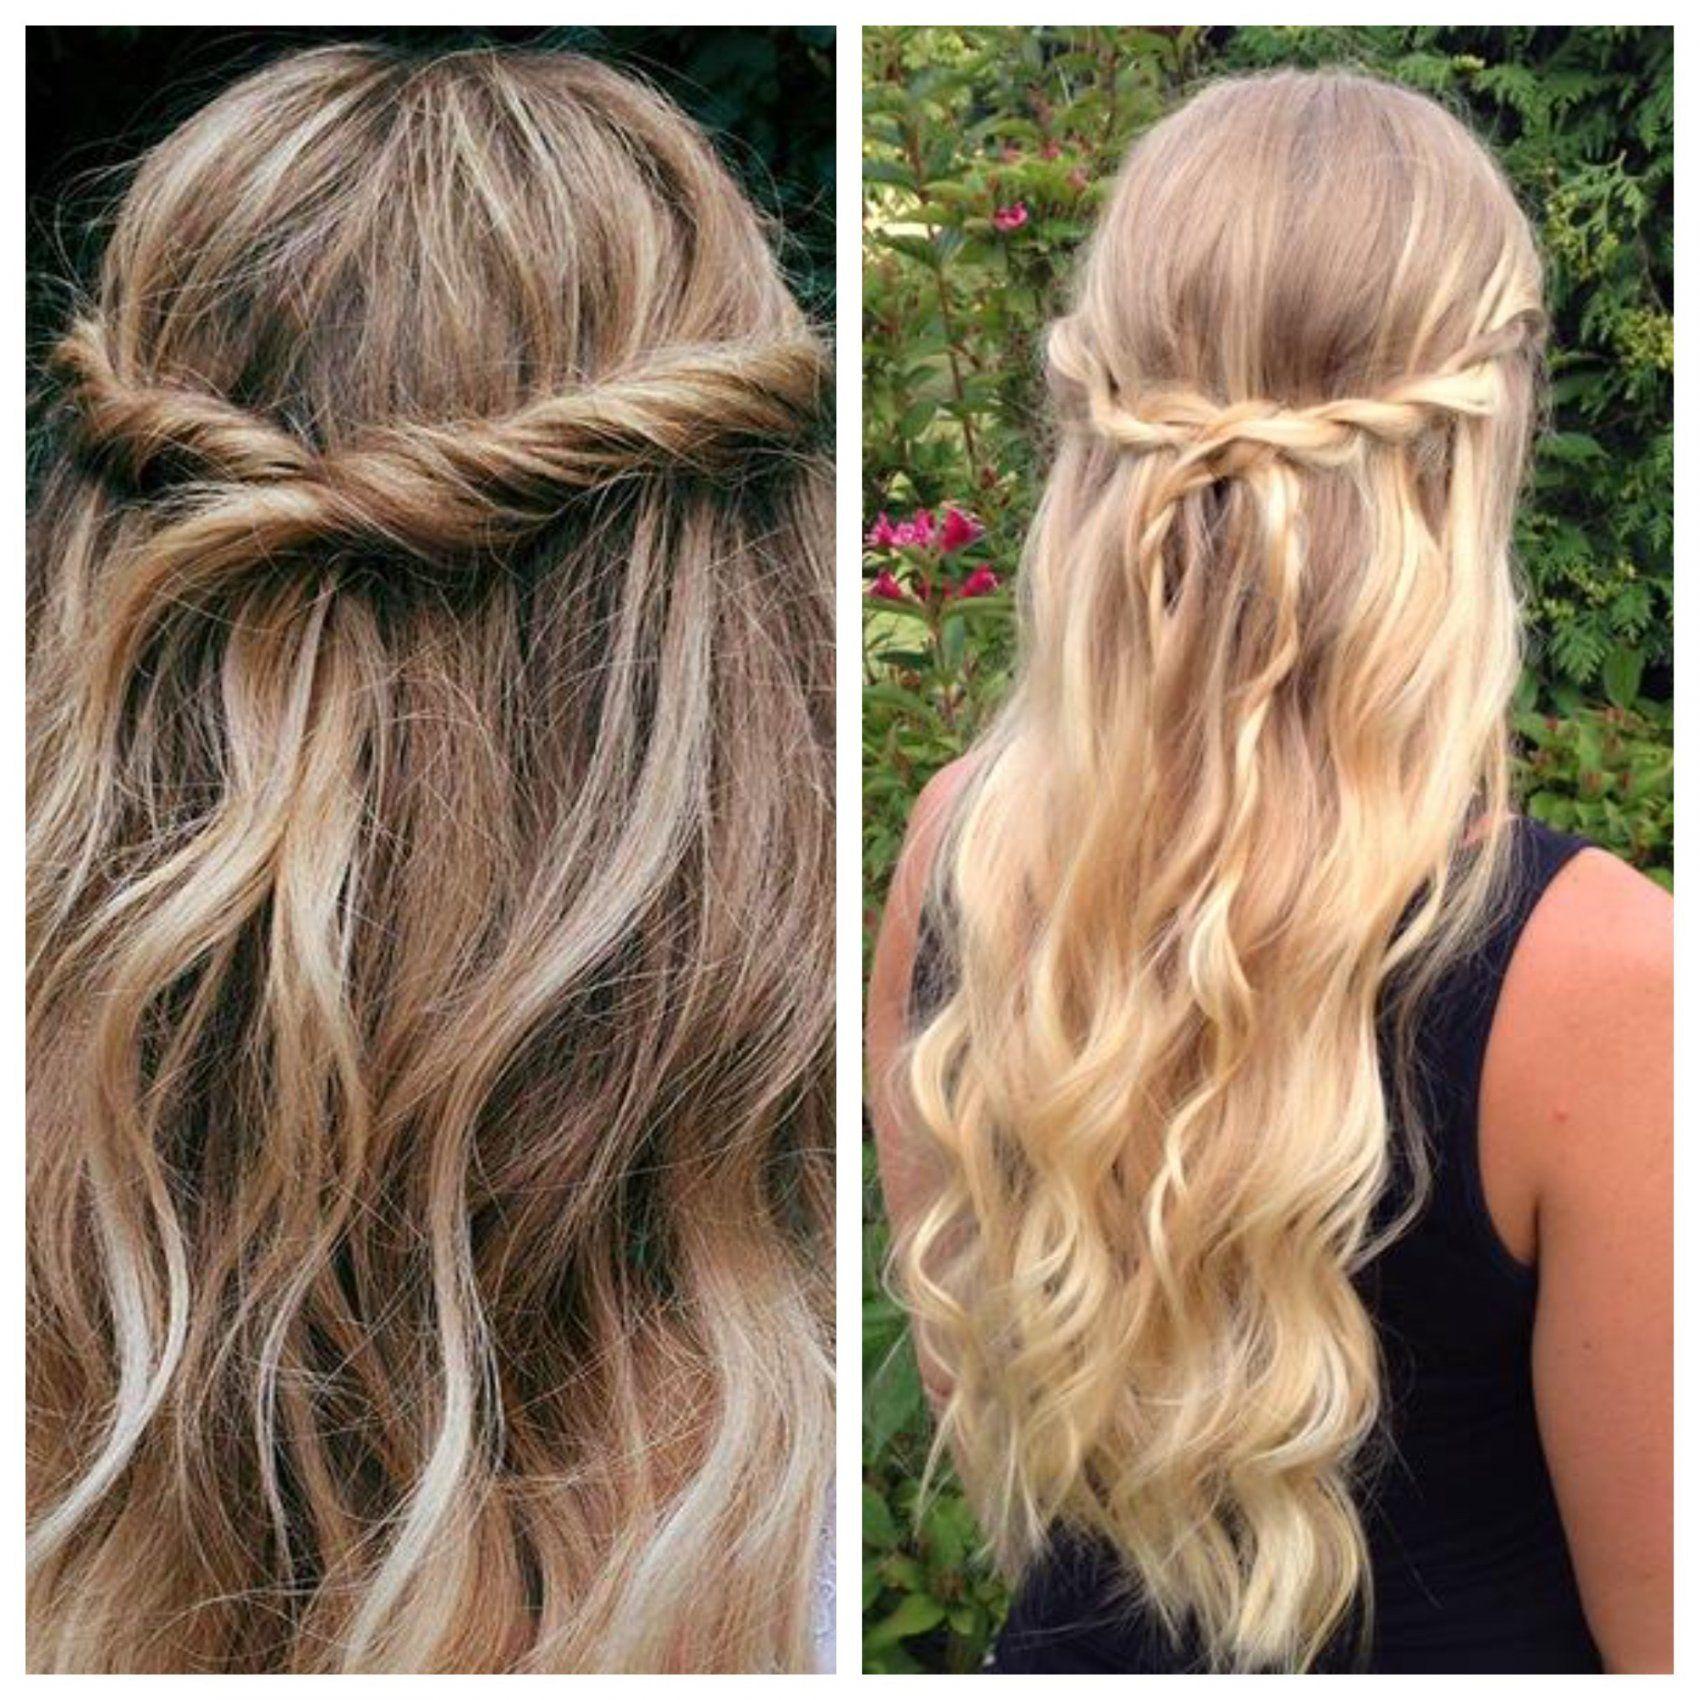 easy half up half down hairstyles   hairstyles half up